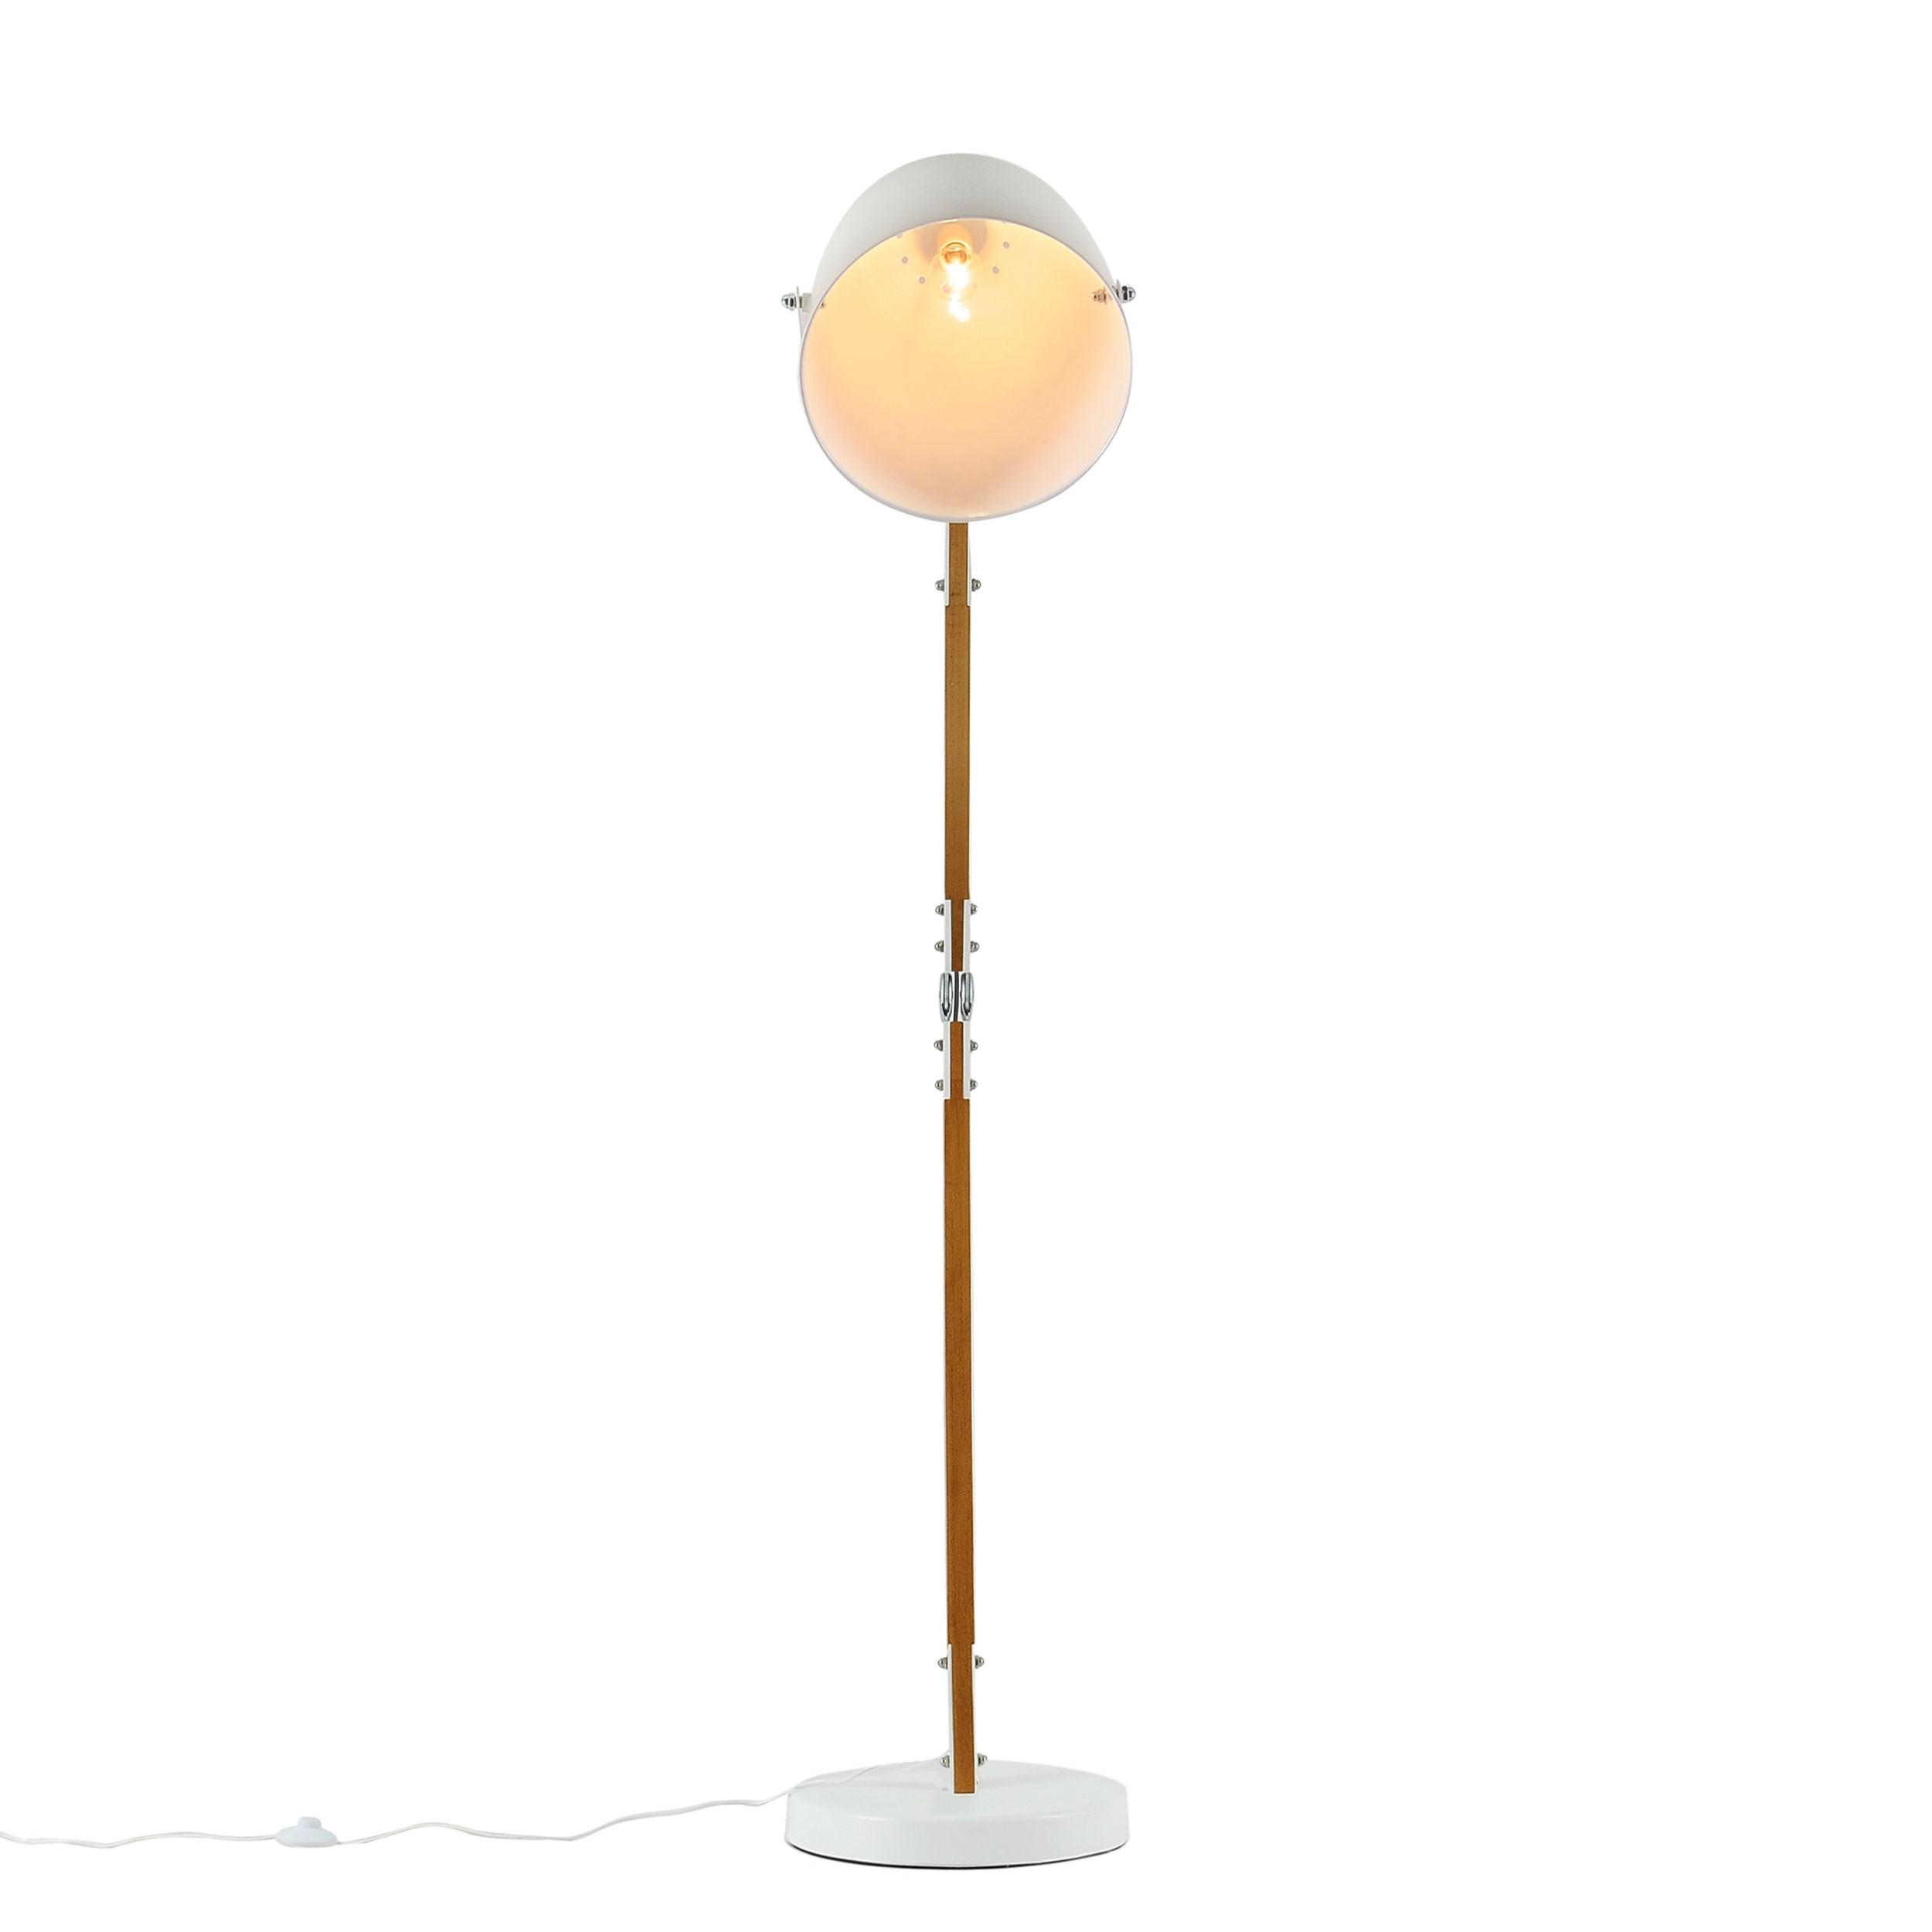 Lampadaire blanc design lampadaire bois blanc hcm owalo - Lampadaire bois blanc ...